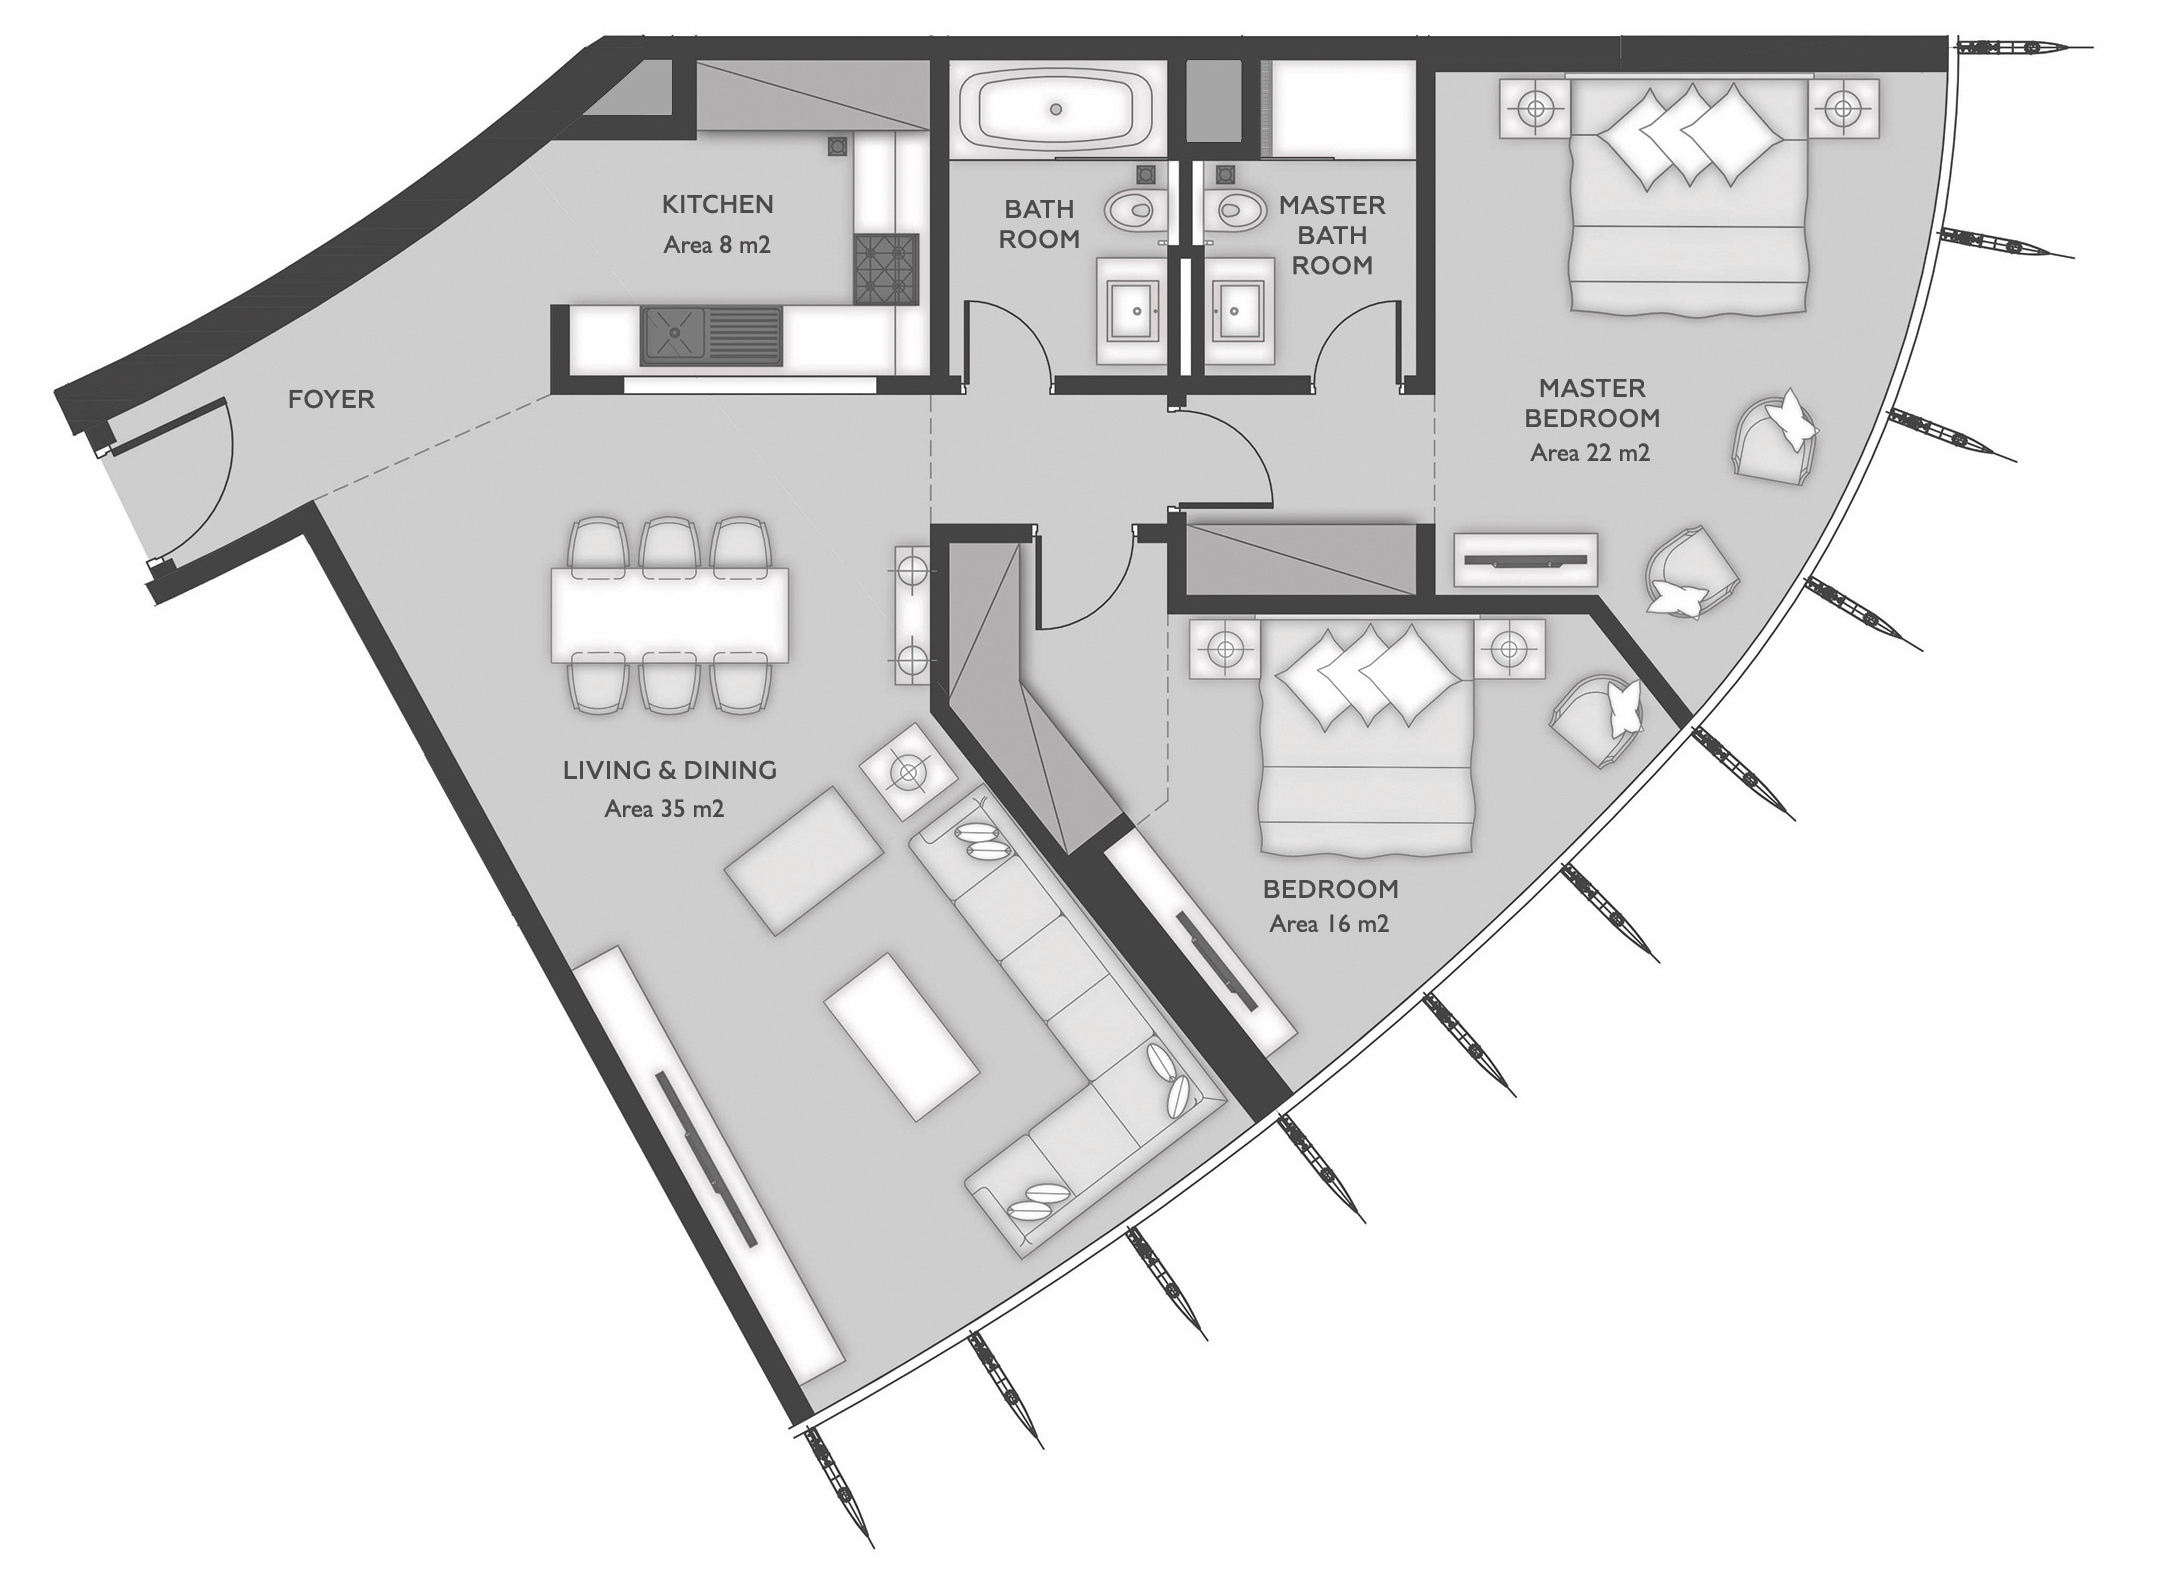 شقة بغرفتي نوم